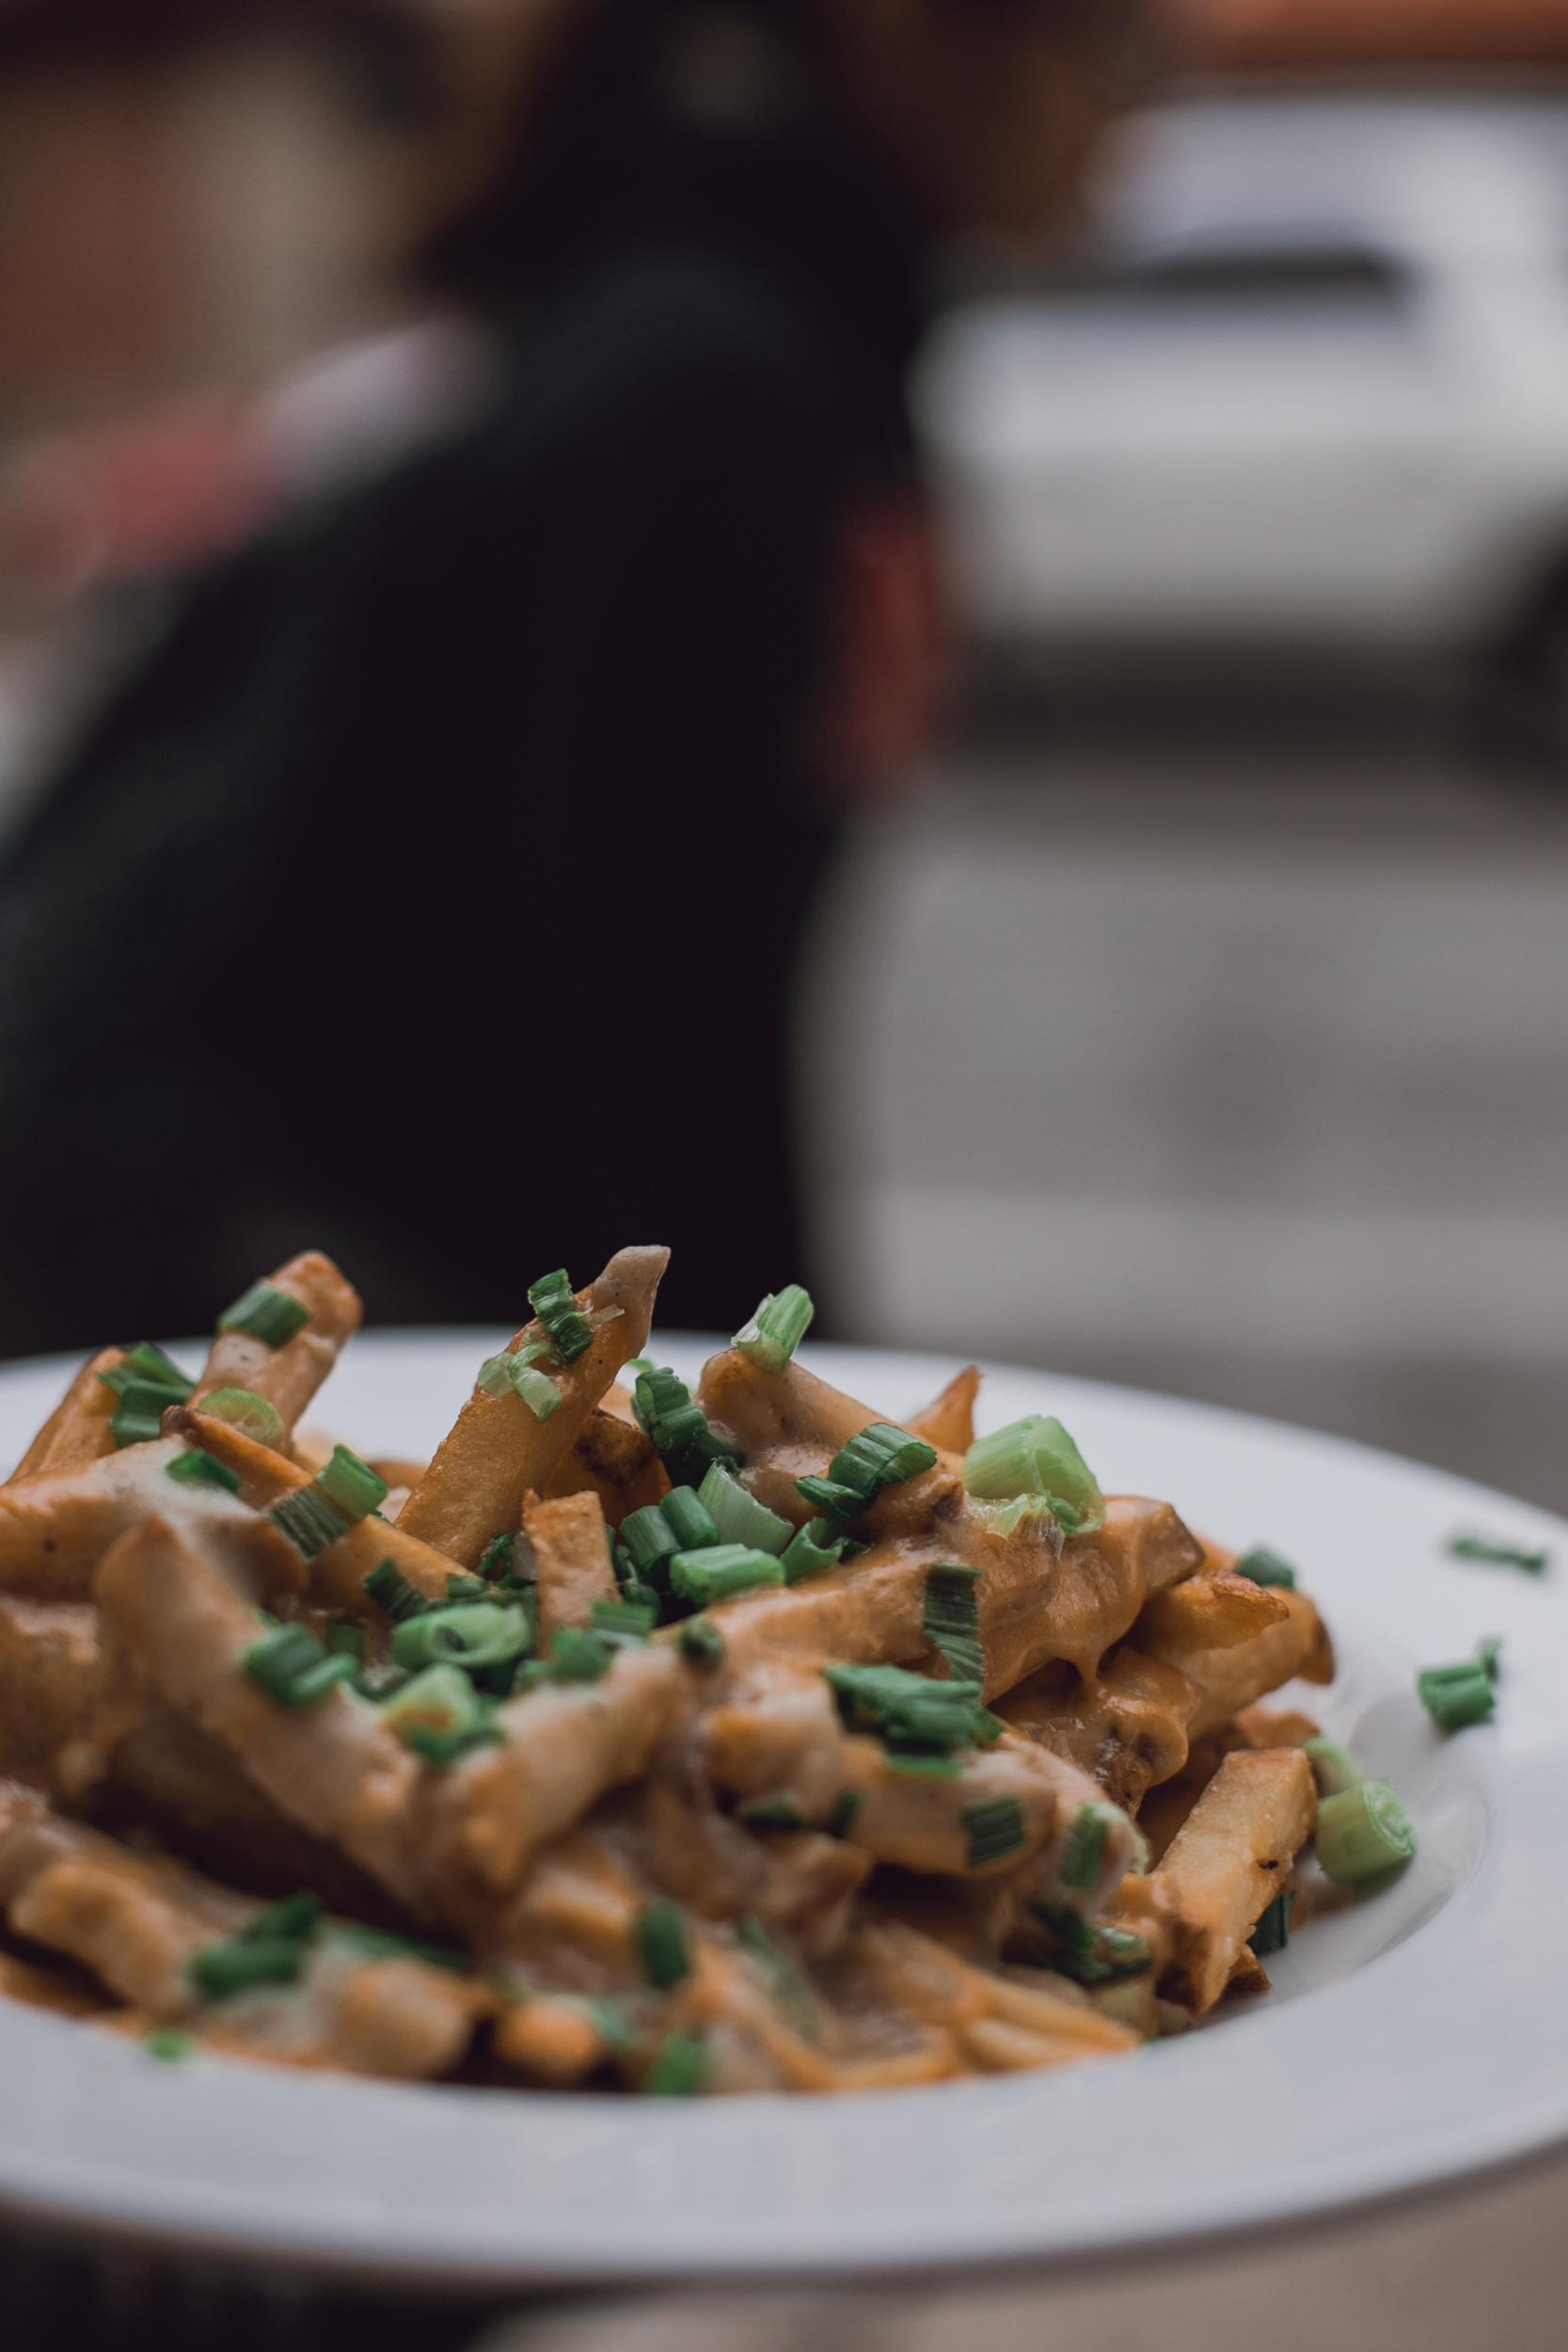 vegan diner chicago, Chicago Restaurant, the chicago diner, meat free since '83, french fries in chicago, putine fries in chicago, vegan food in chicago-www.rachelsmak.com7.jpg